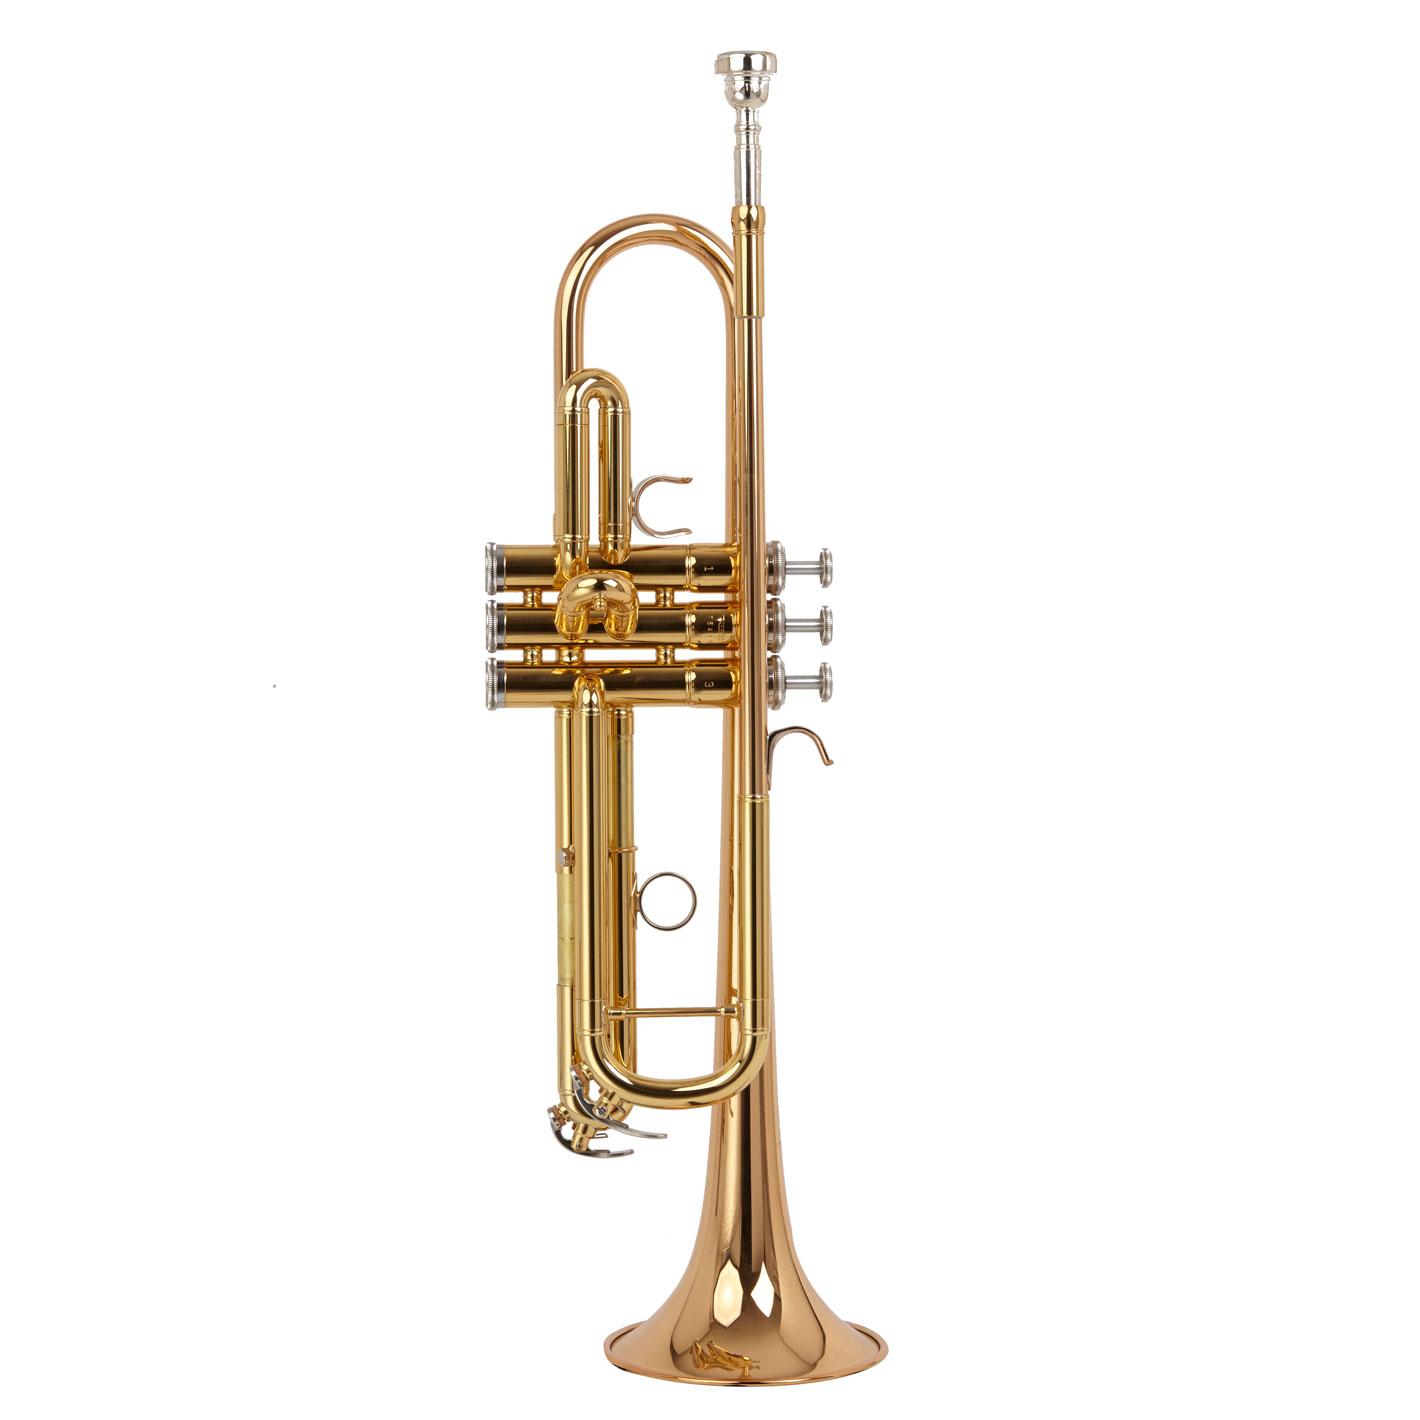 Yamaha YTR 4335 Trumpet